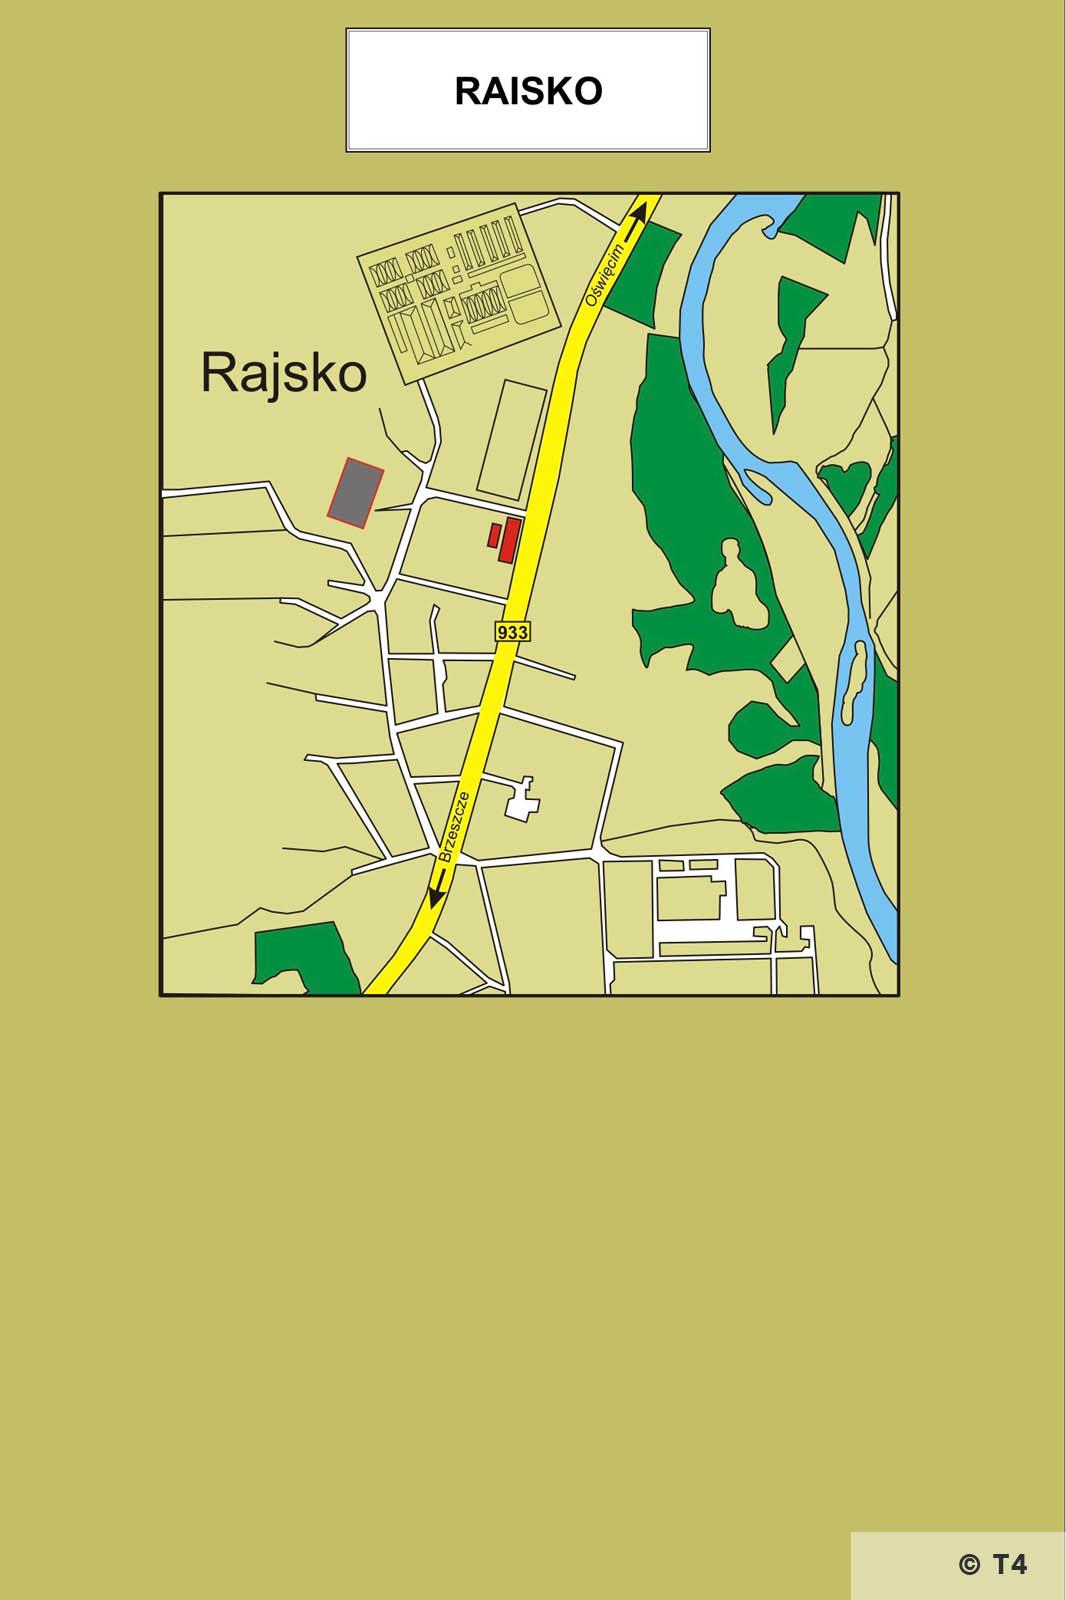 Map of Rajsko area.T4 jpeg